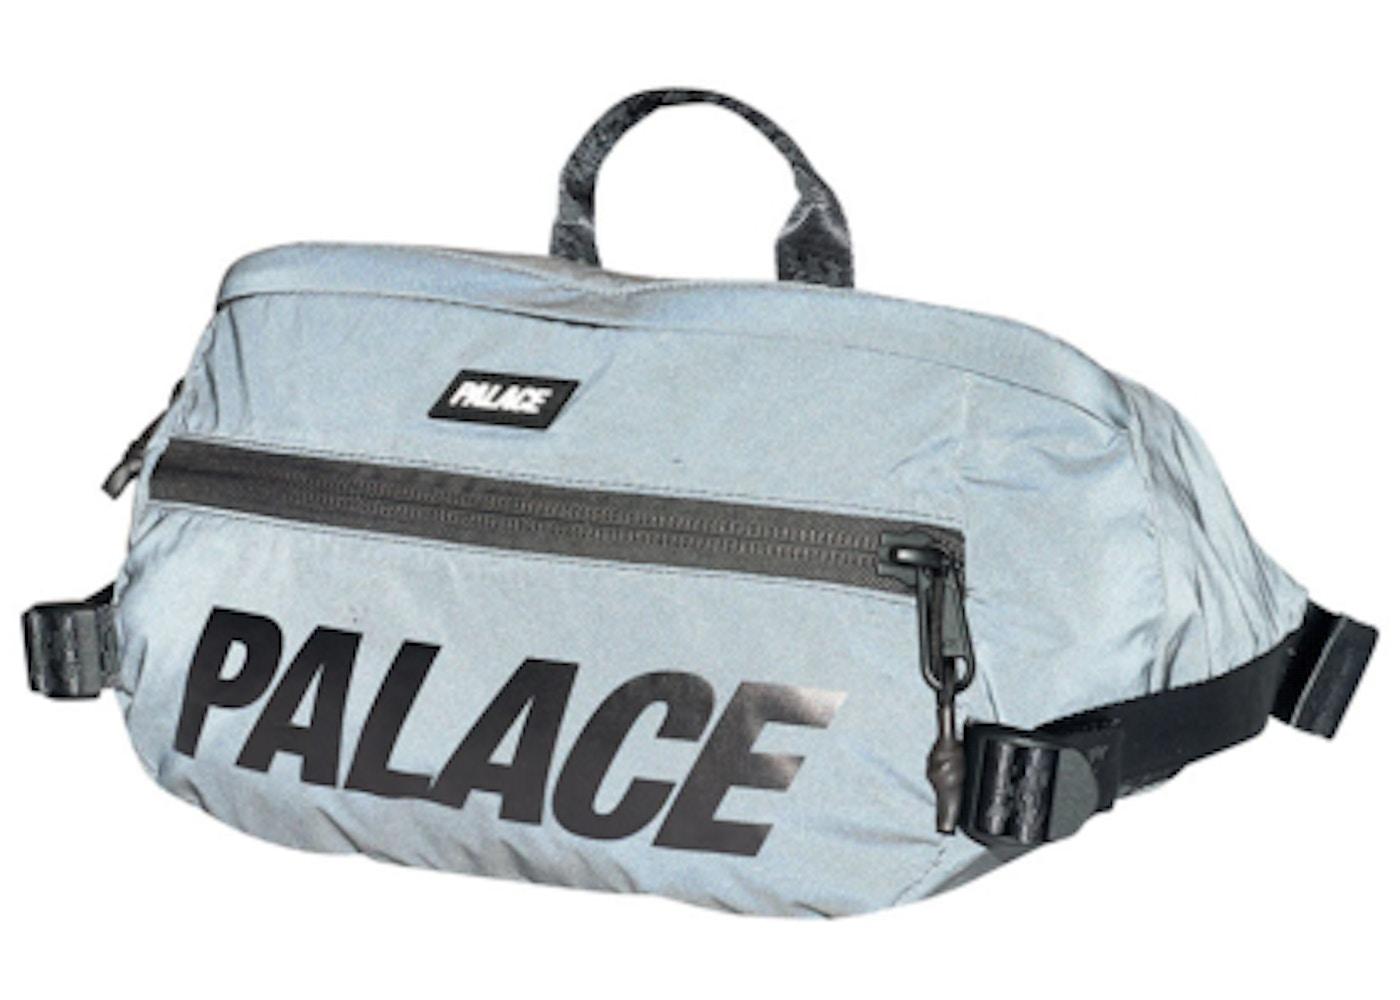 89f4e8ce Palace Bags - Buy & Sell Streetwear